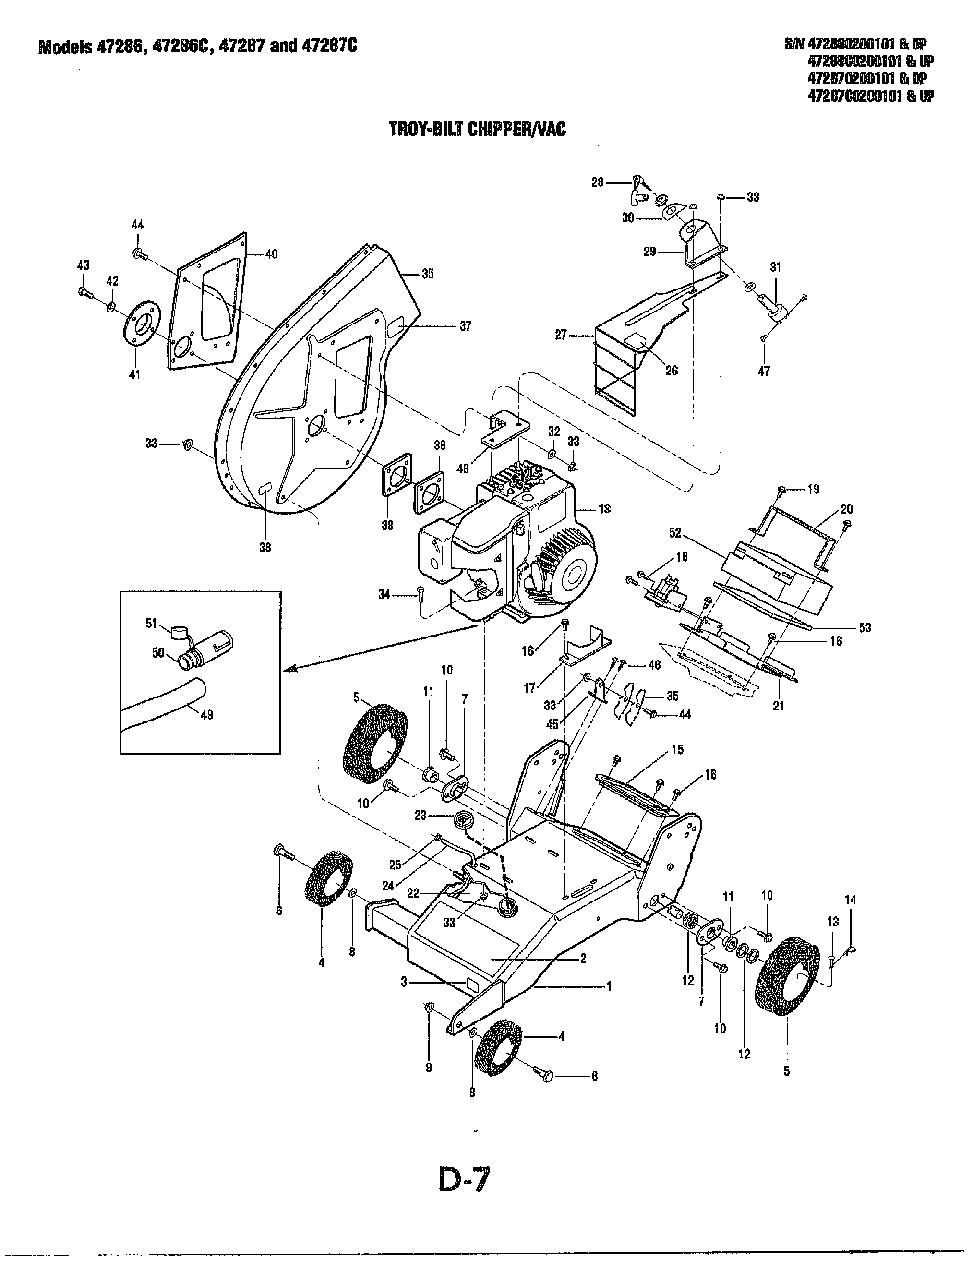 Troy Bilt Gardenway Chipper Vac Parts Manual Page D7